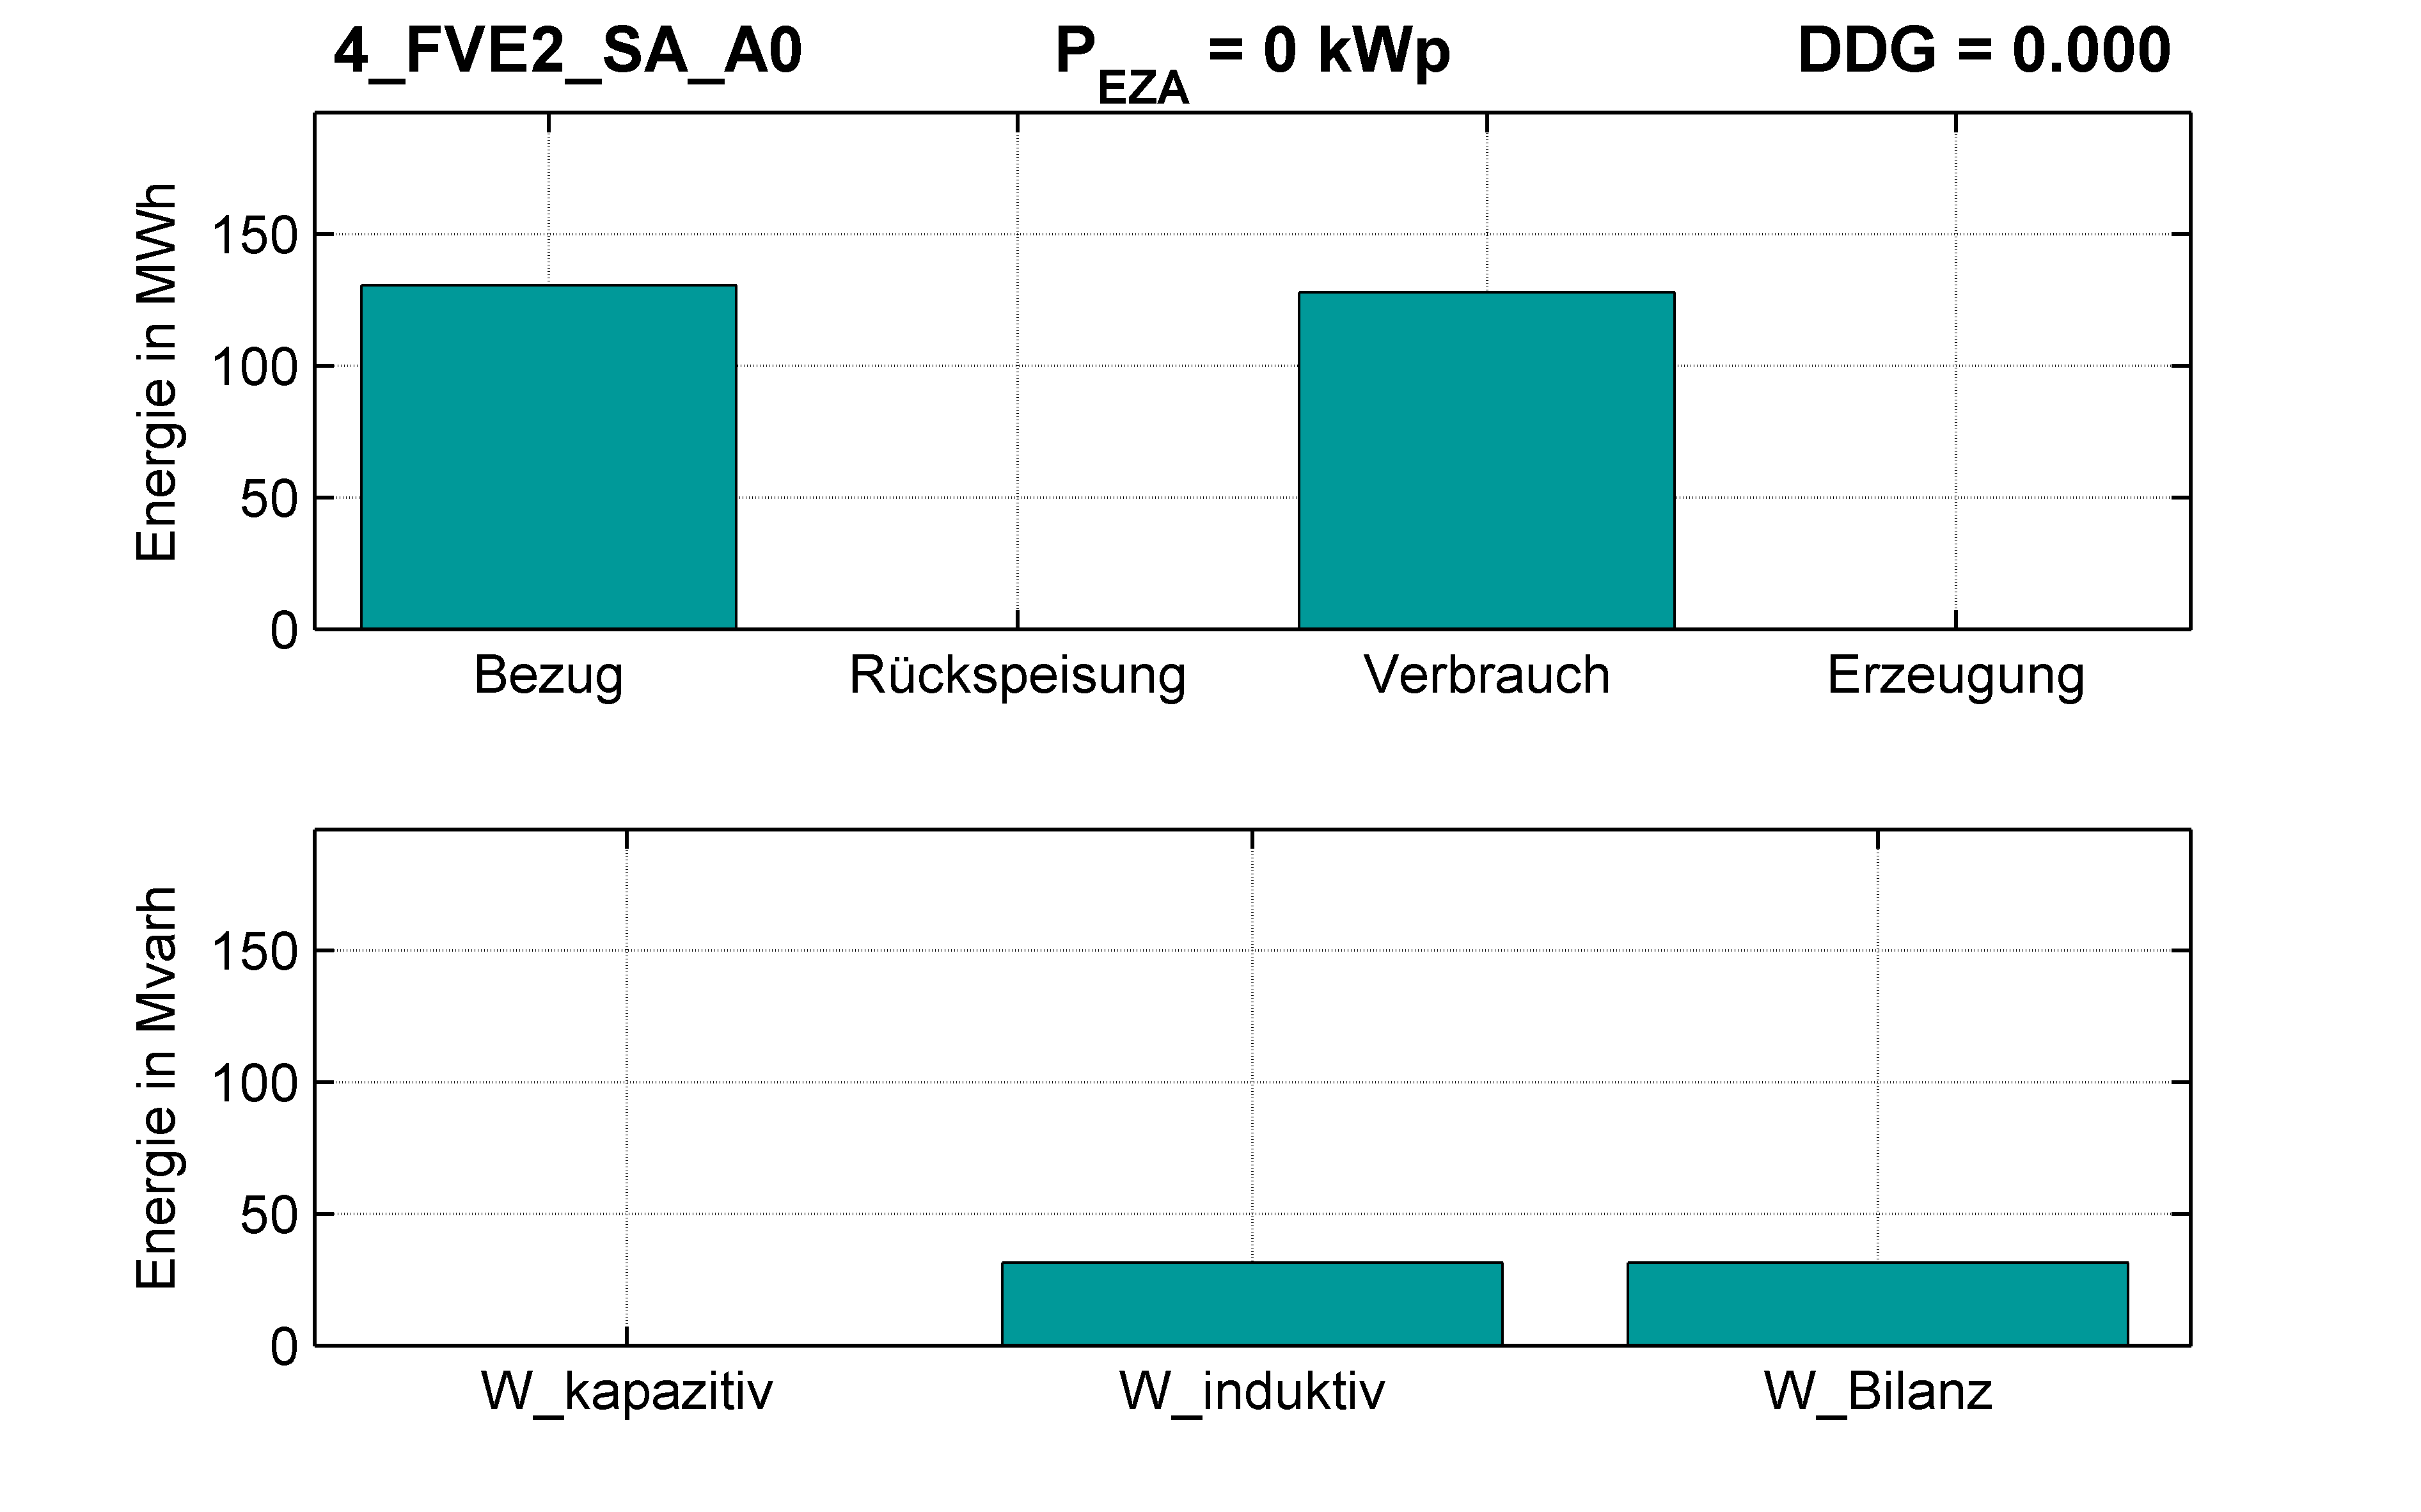 FVE2 | P-Kappung 55% (SA) A0 | PQ-Bilanz